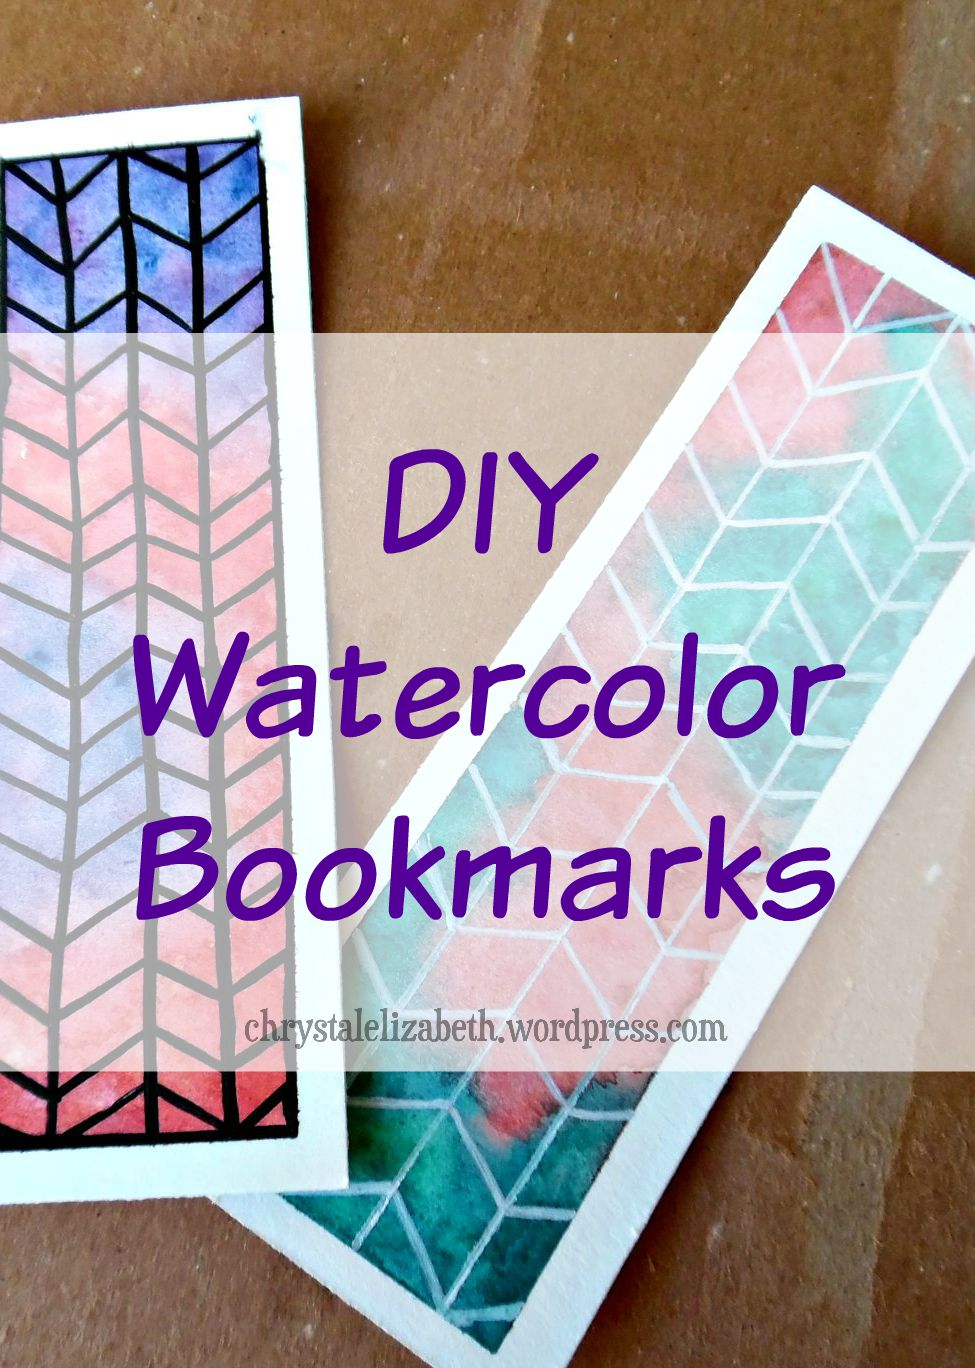 Watercolor bookmark patterns - Diy Watercolor Bookmark Chrystalelizabeth